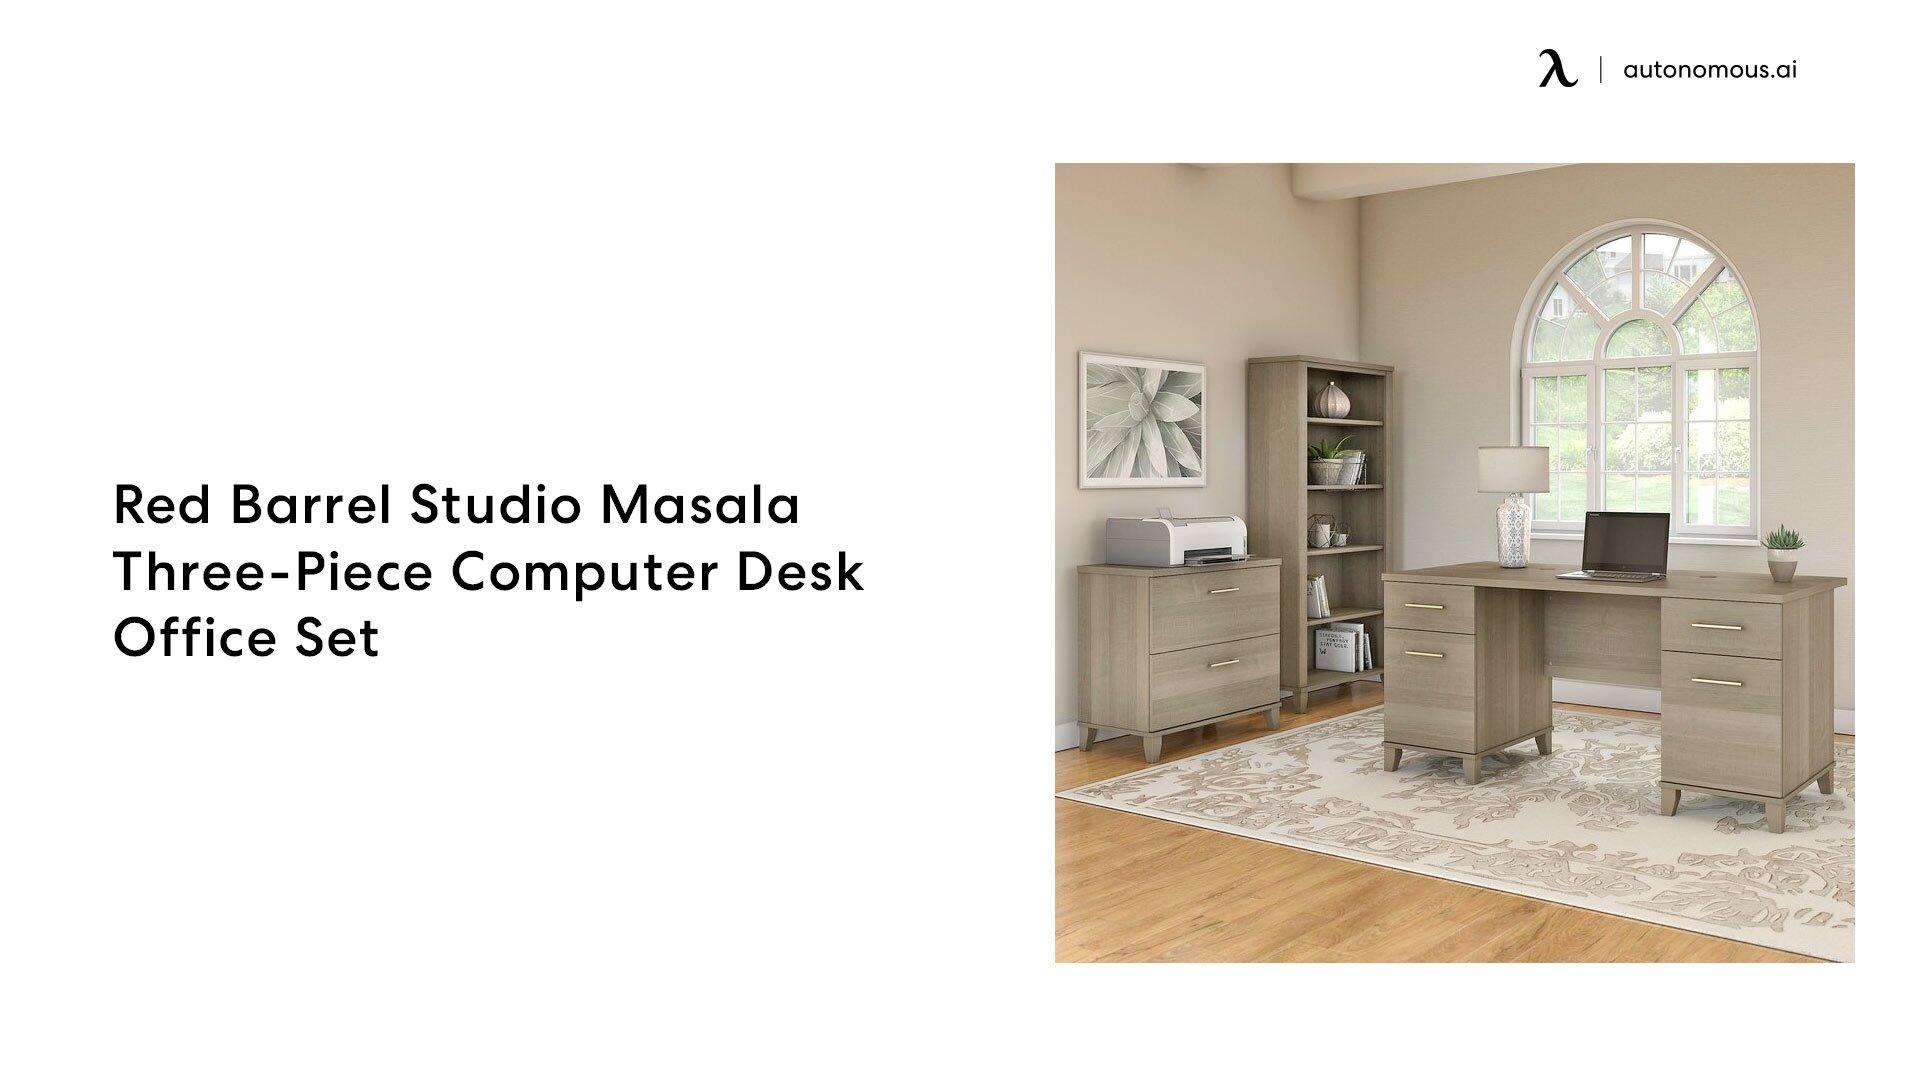 Red Barrel Studio Masala Three-Piece office desk set